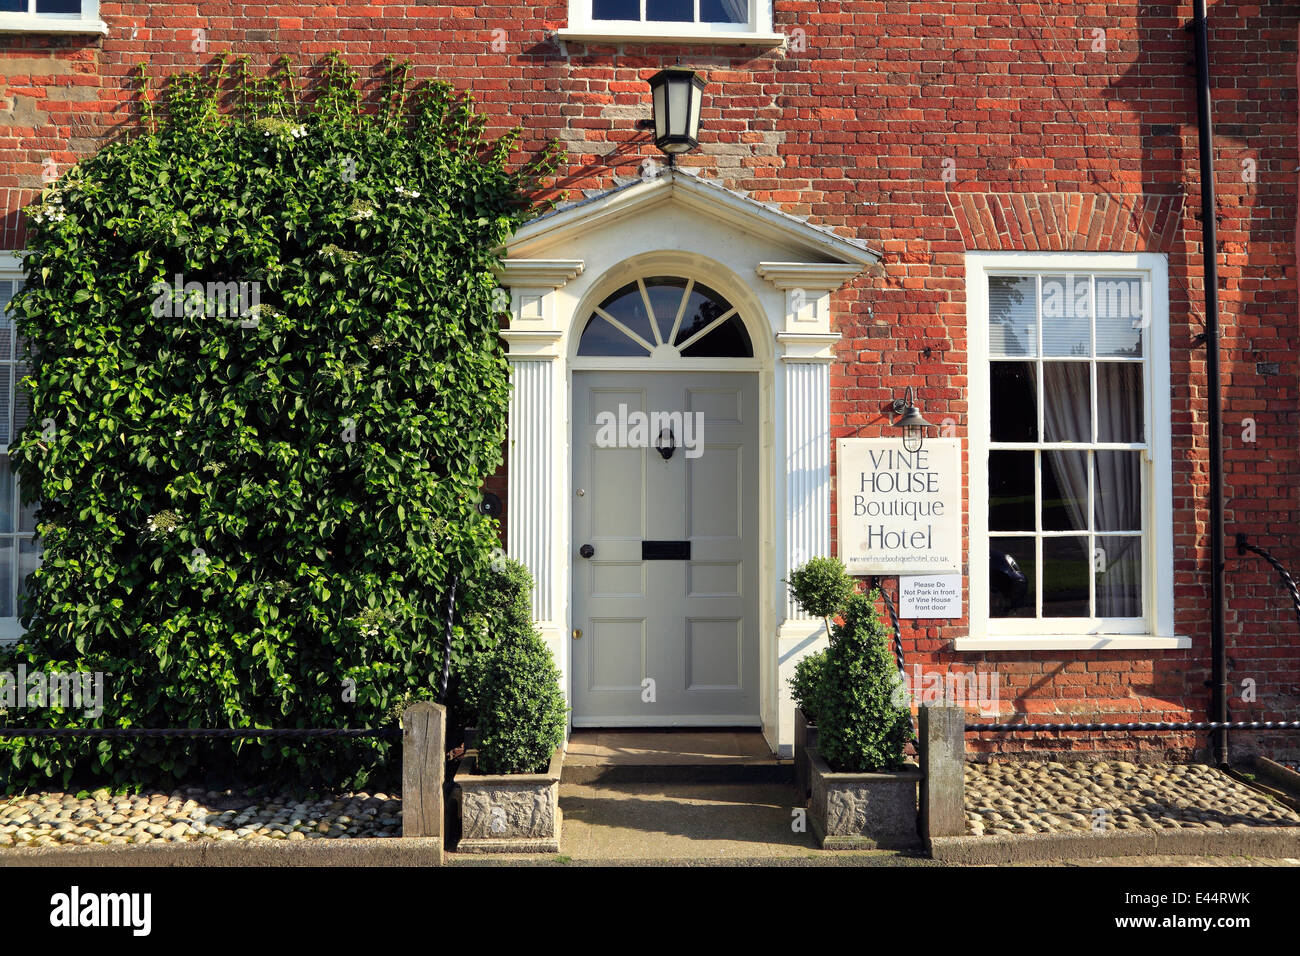 Burnham Market, Vine House Boutique Hotel, Norfolk England UK hotels - Stock Image